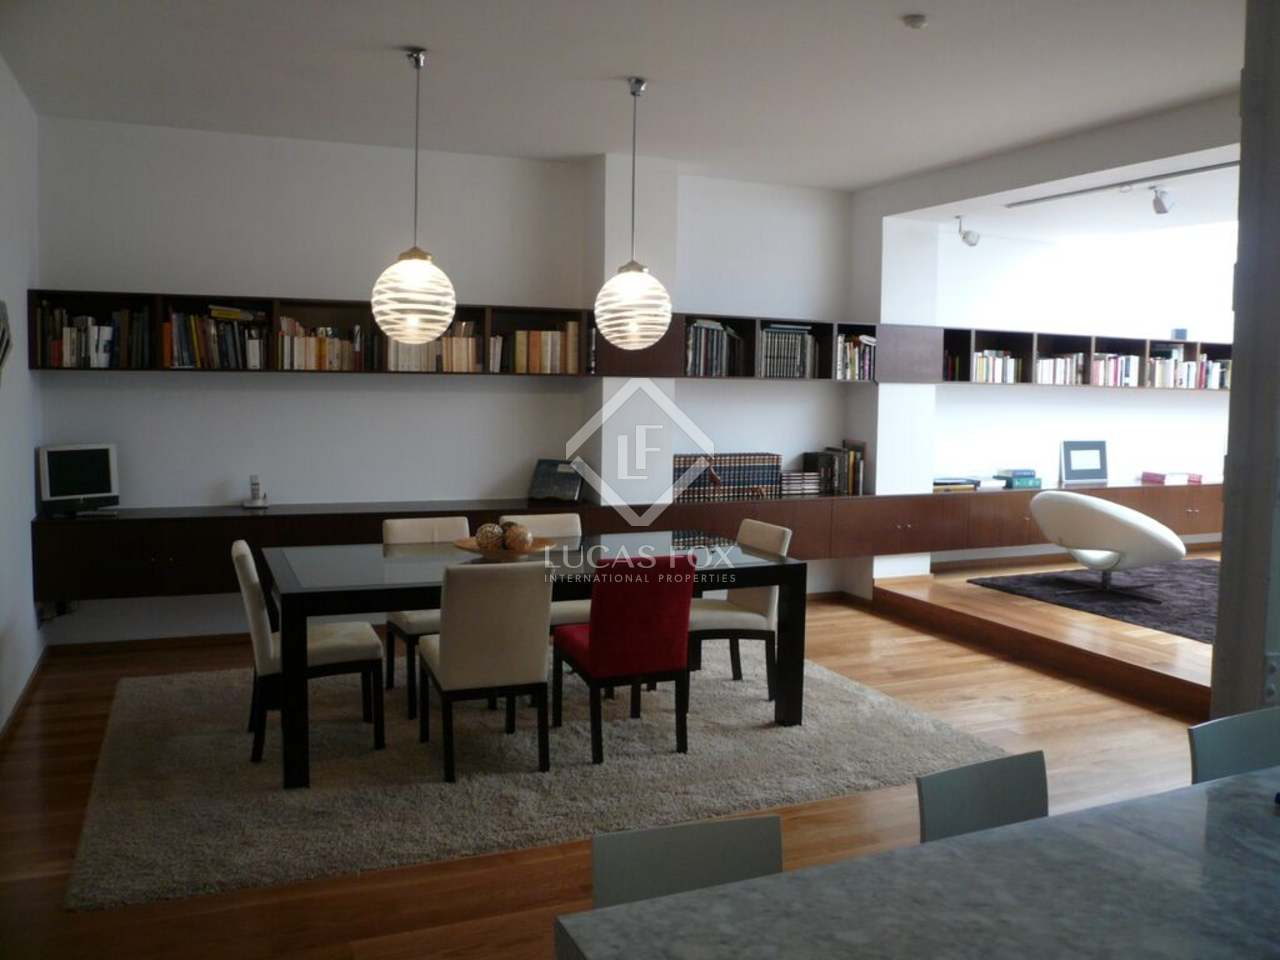 Loft apartment for sale in el botanico area of valencia - Loft valencia ...